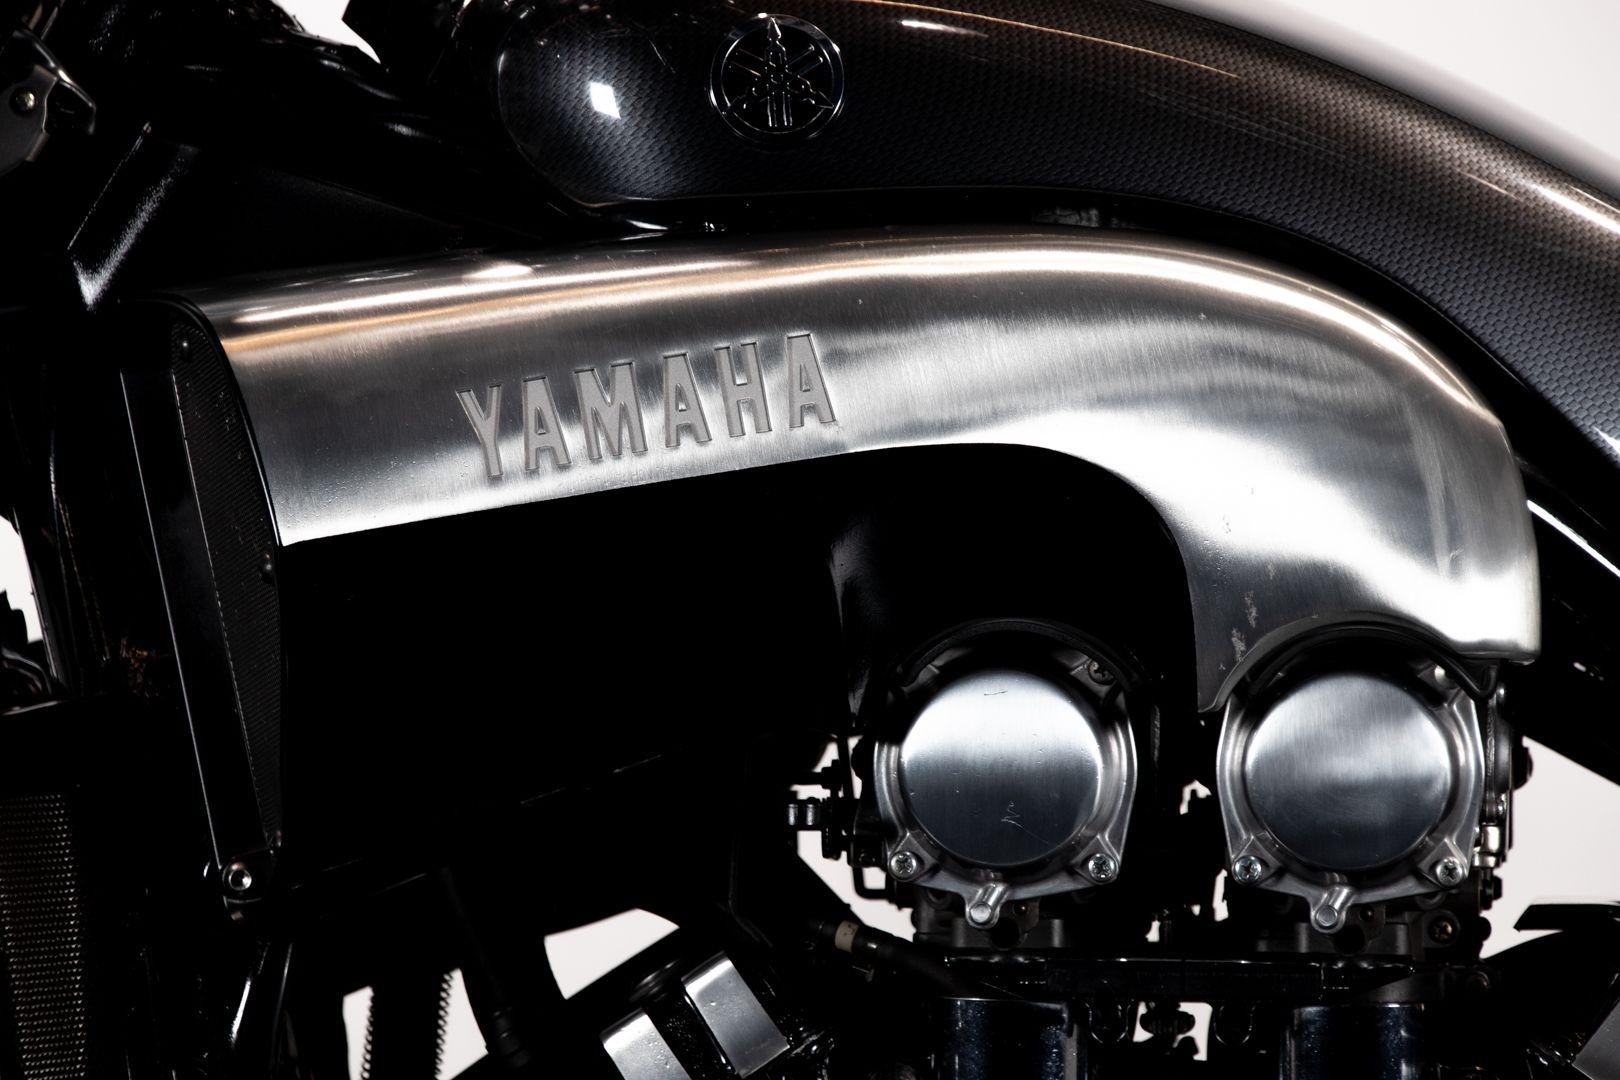 2001 Yamaha V MAX 73440